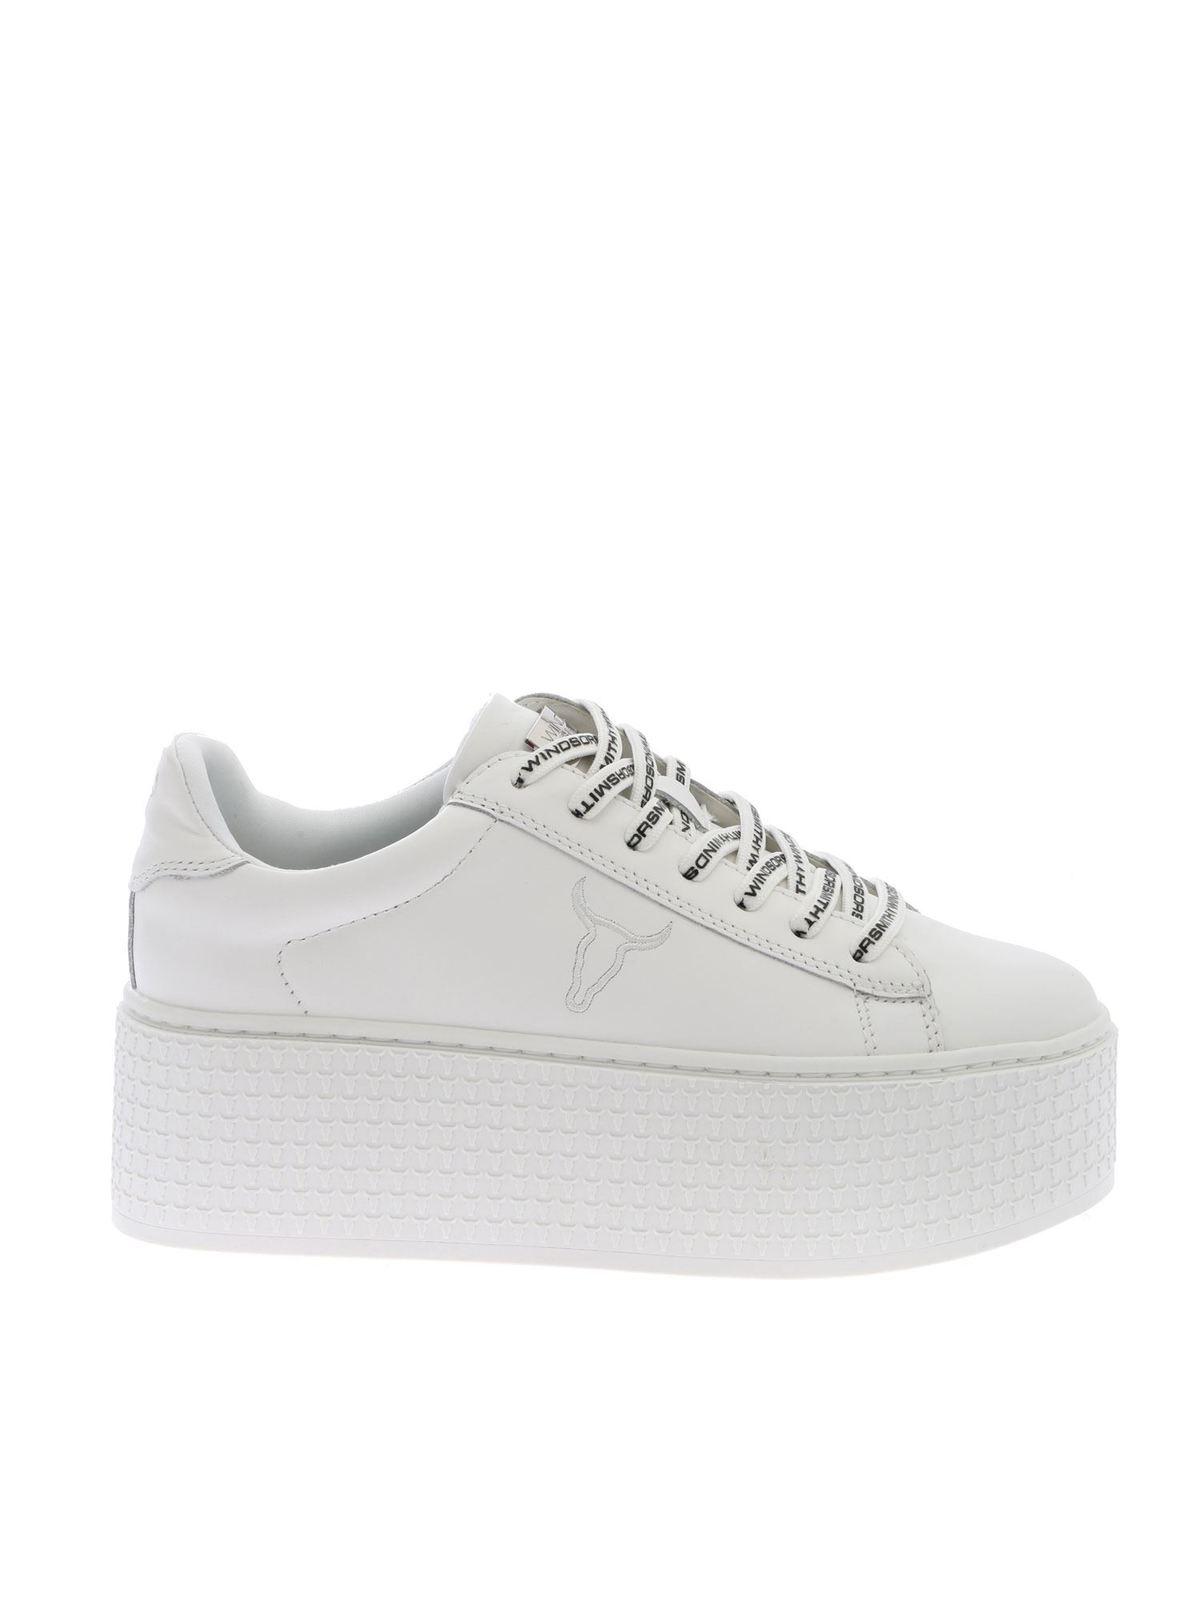 Windsor Smith - White Seoul sneakers